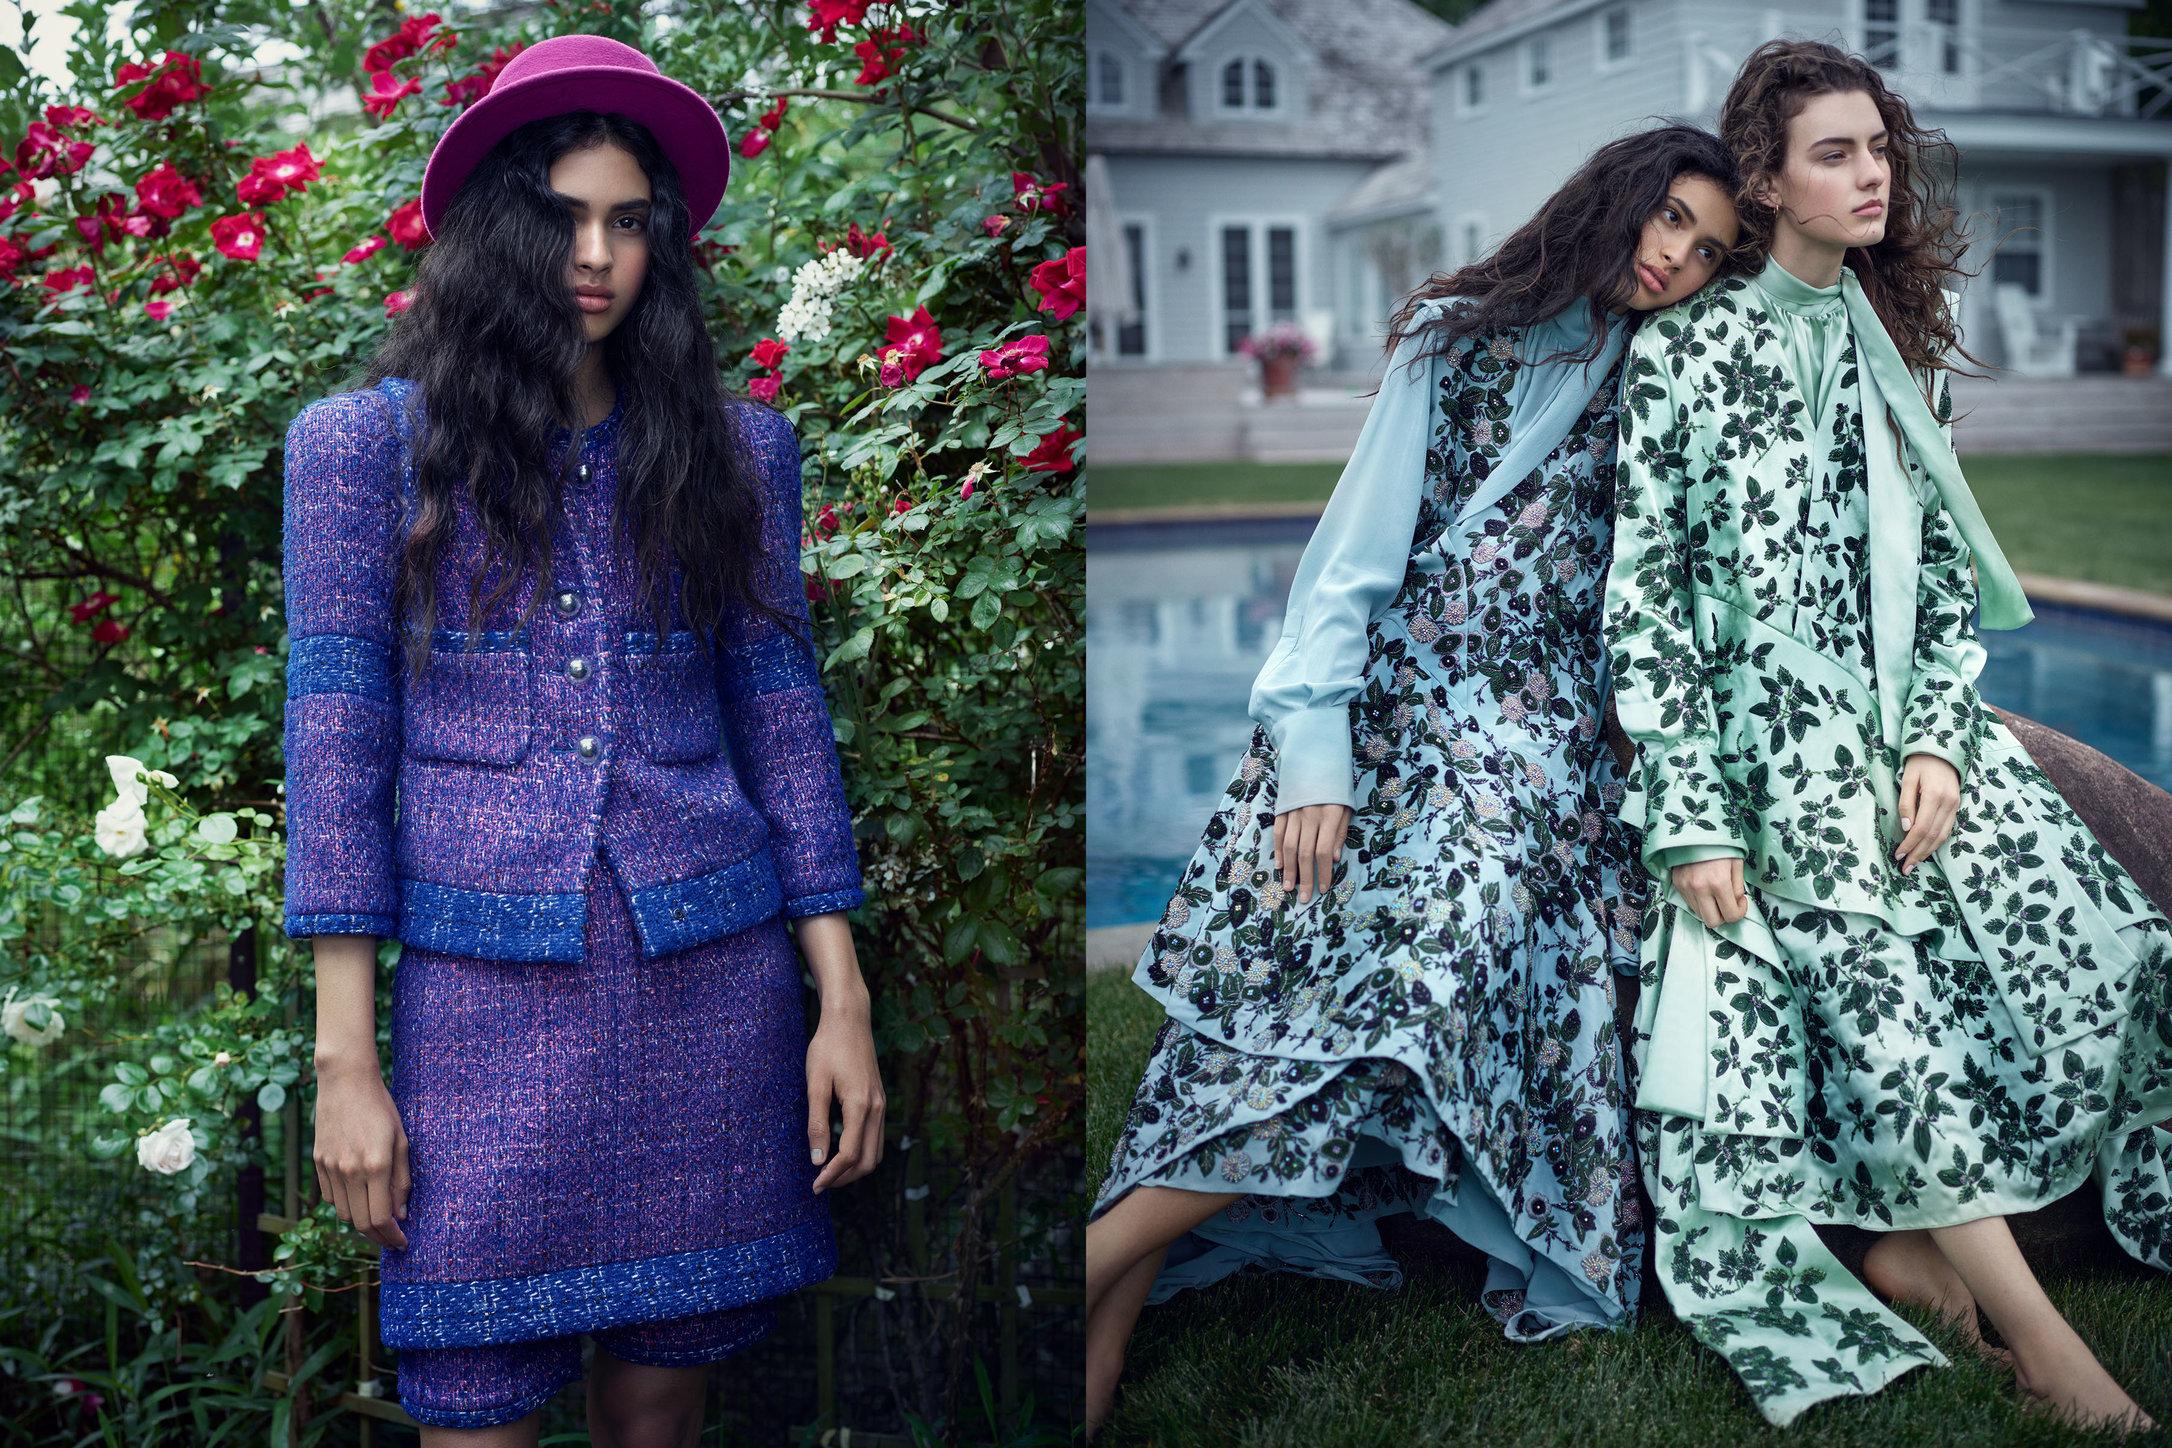 Vogue Japan. Aira Ferreira and Marie Damian. Heaven's Gate, January 2018.